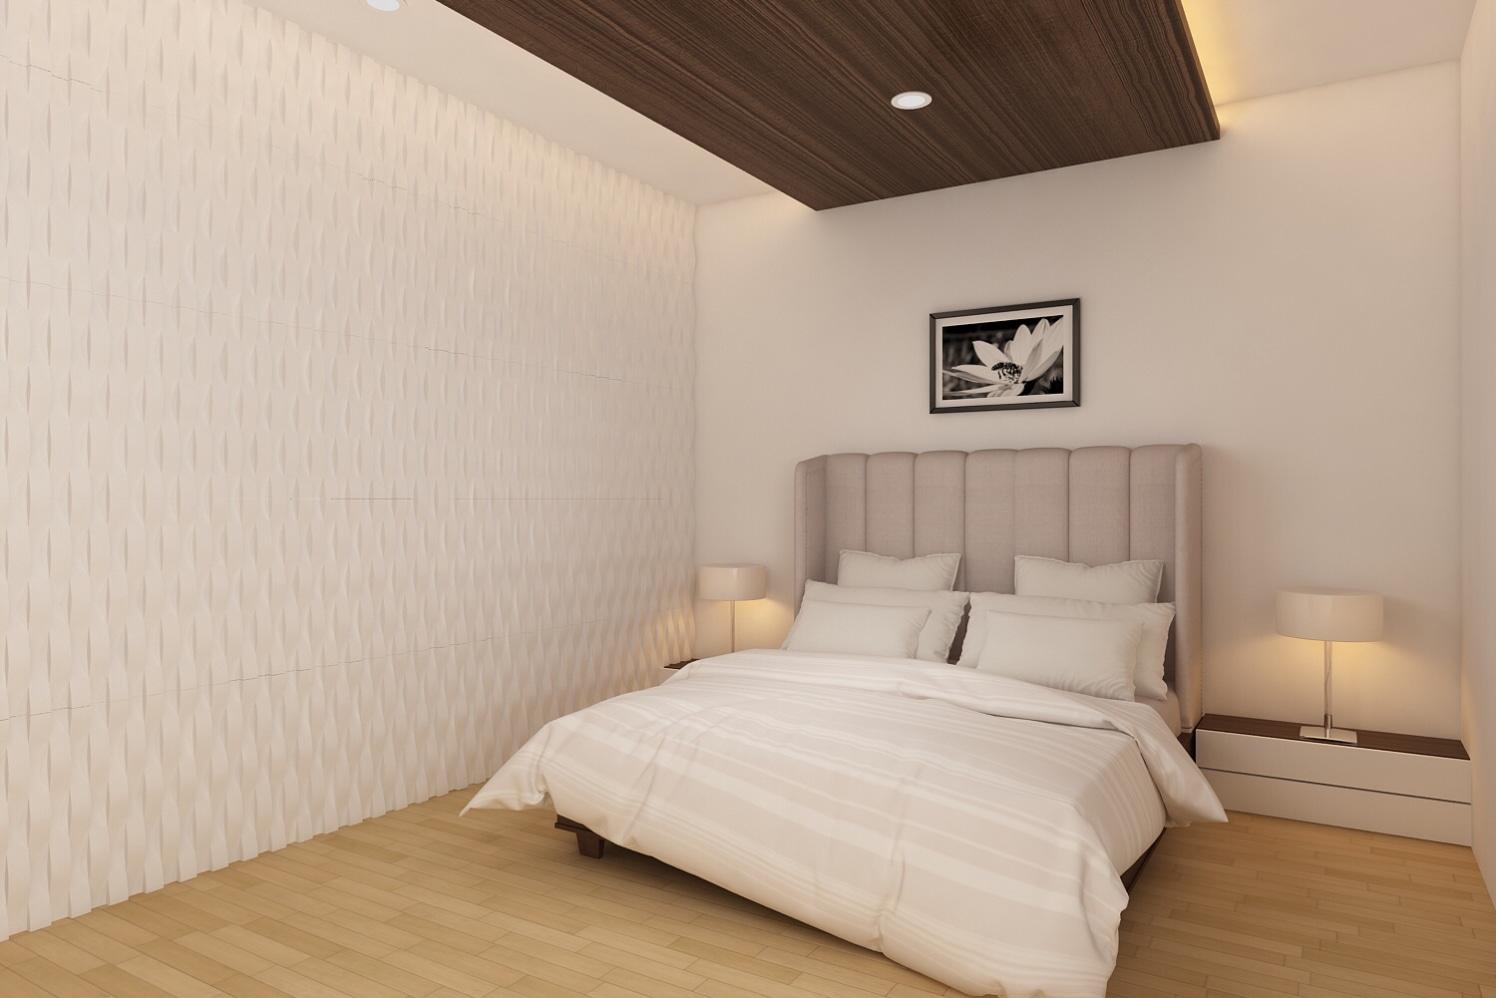 Bedroom Design With Pale Hues by setu.patel Bedroom   Interior Design Photos & Ideas